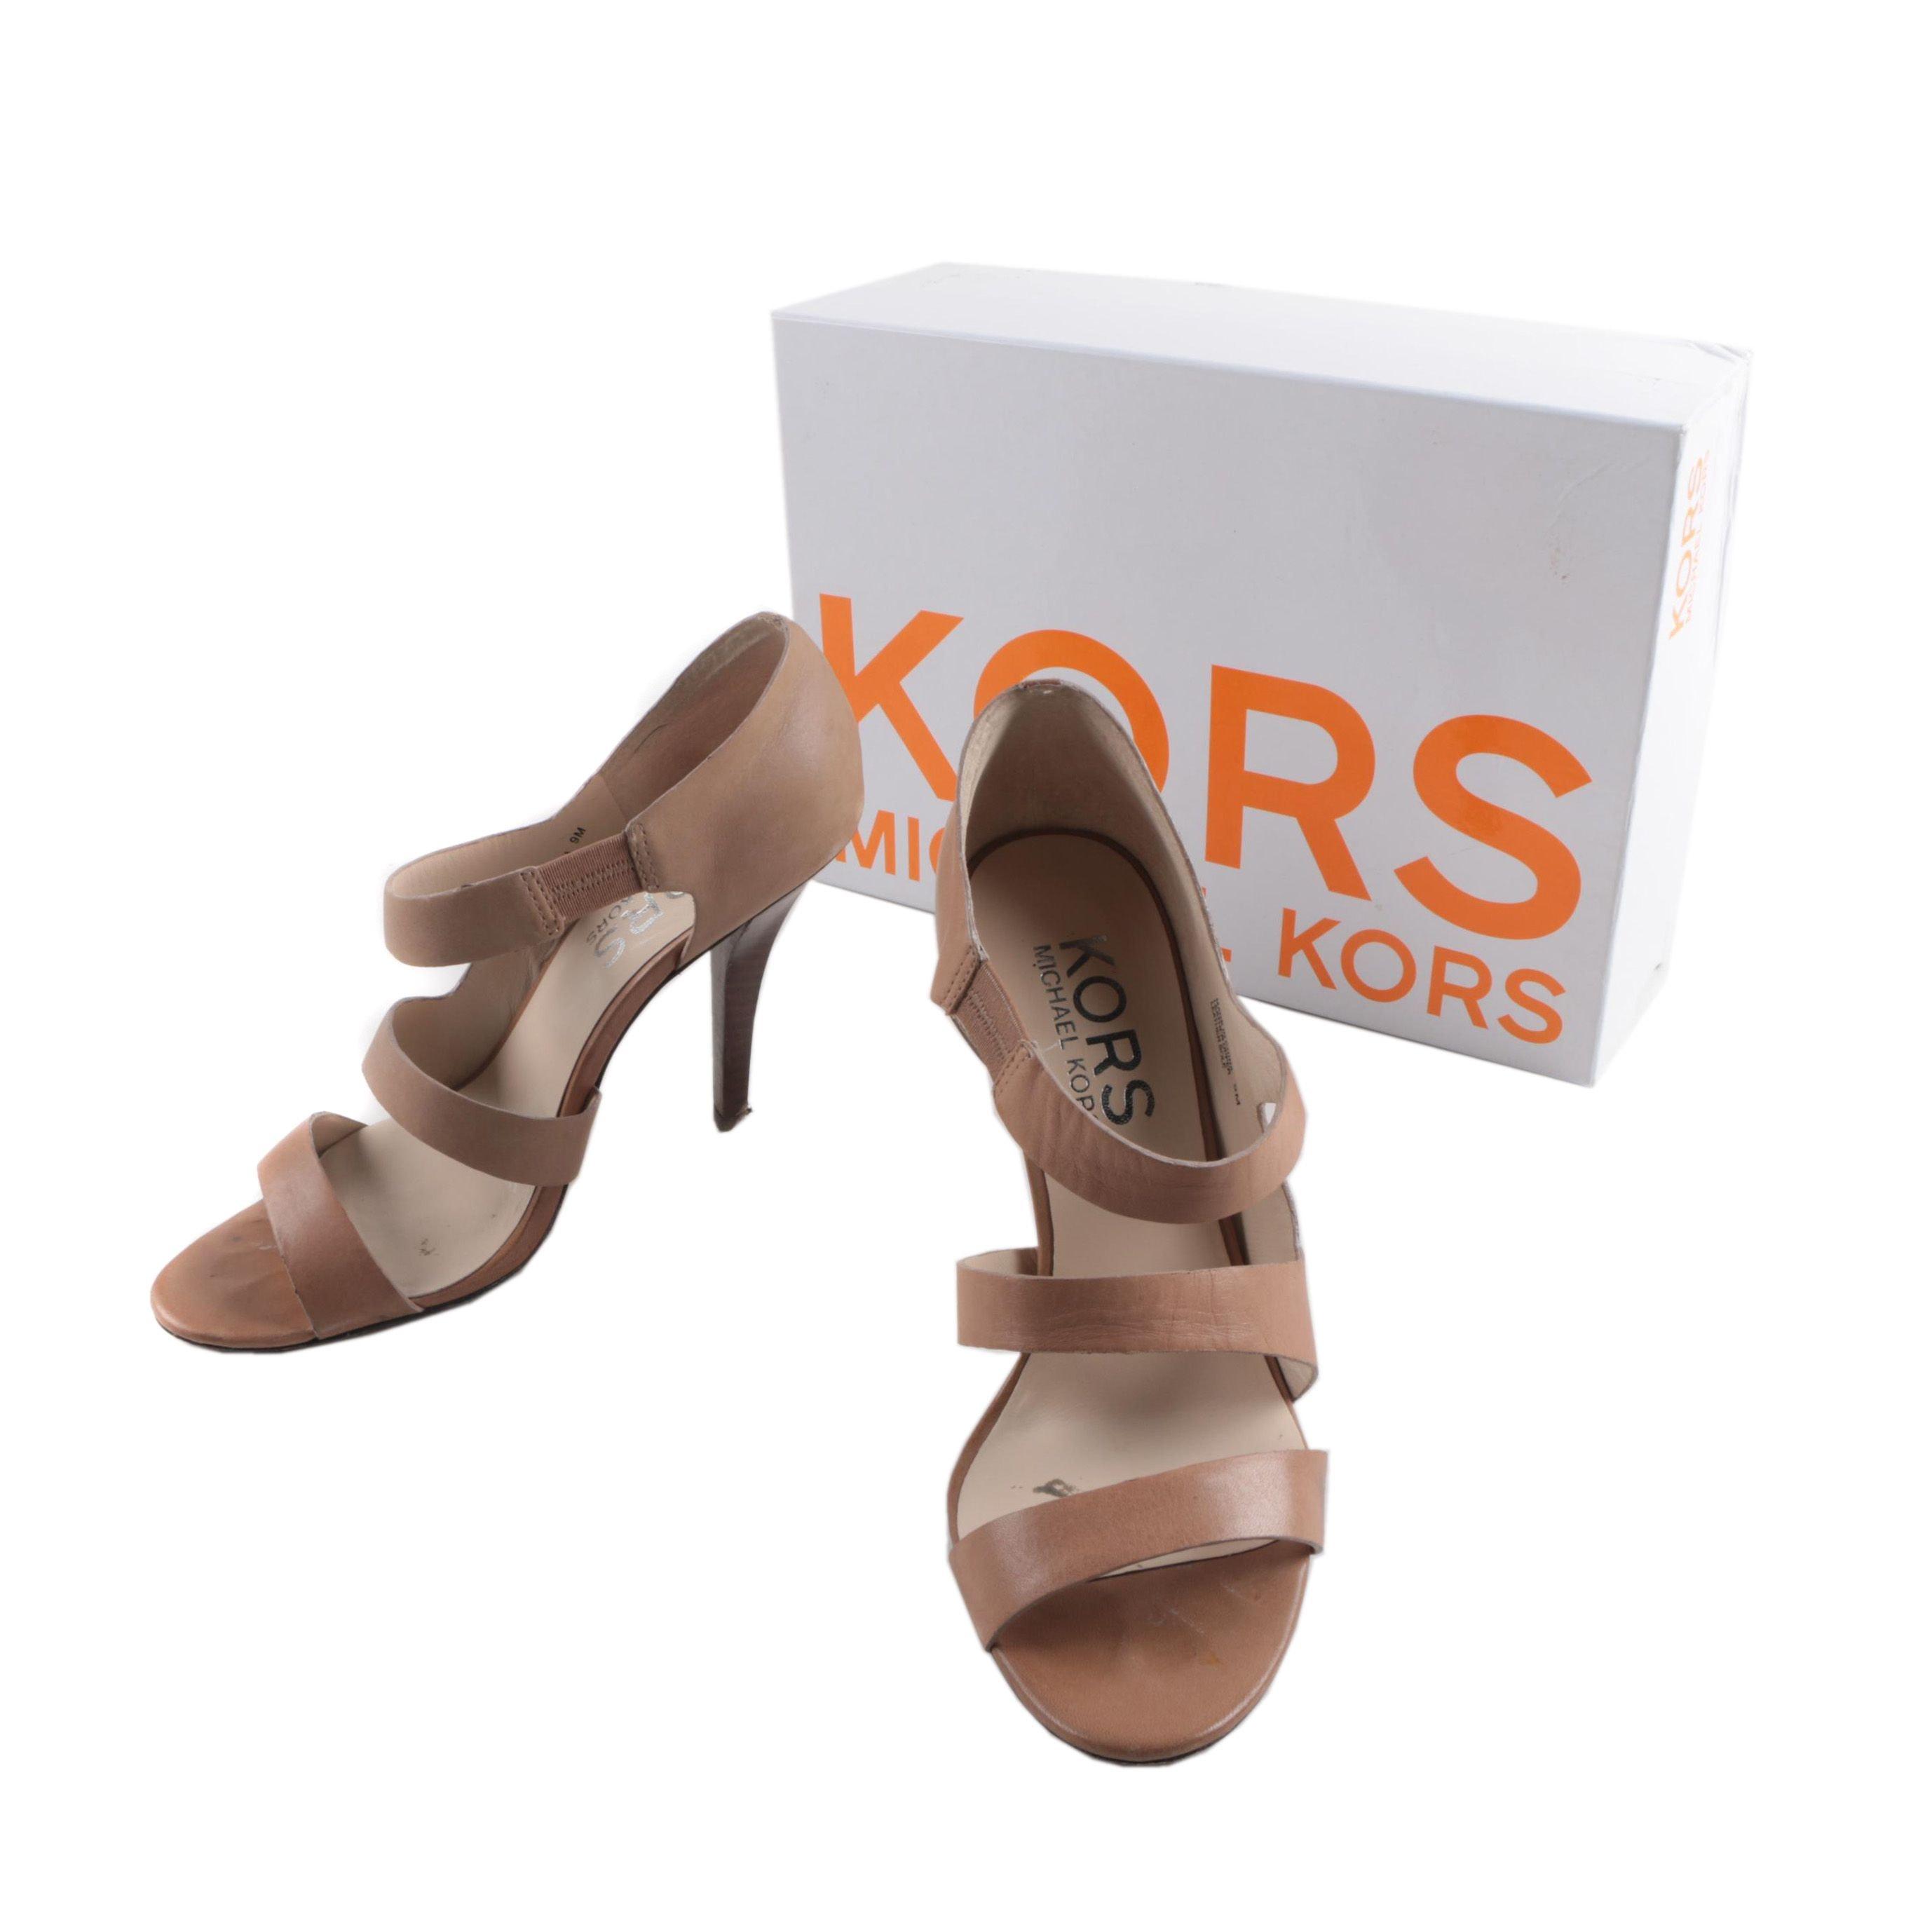 Kors by Michael Kors Tan Leather Heels